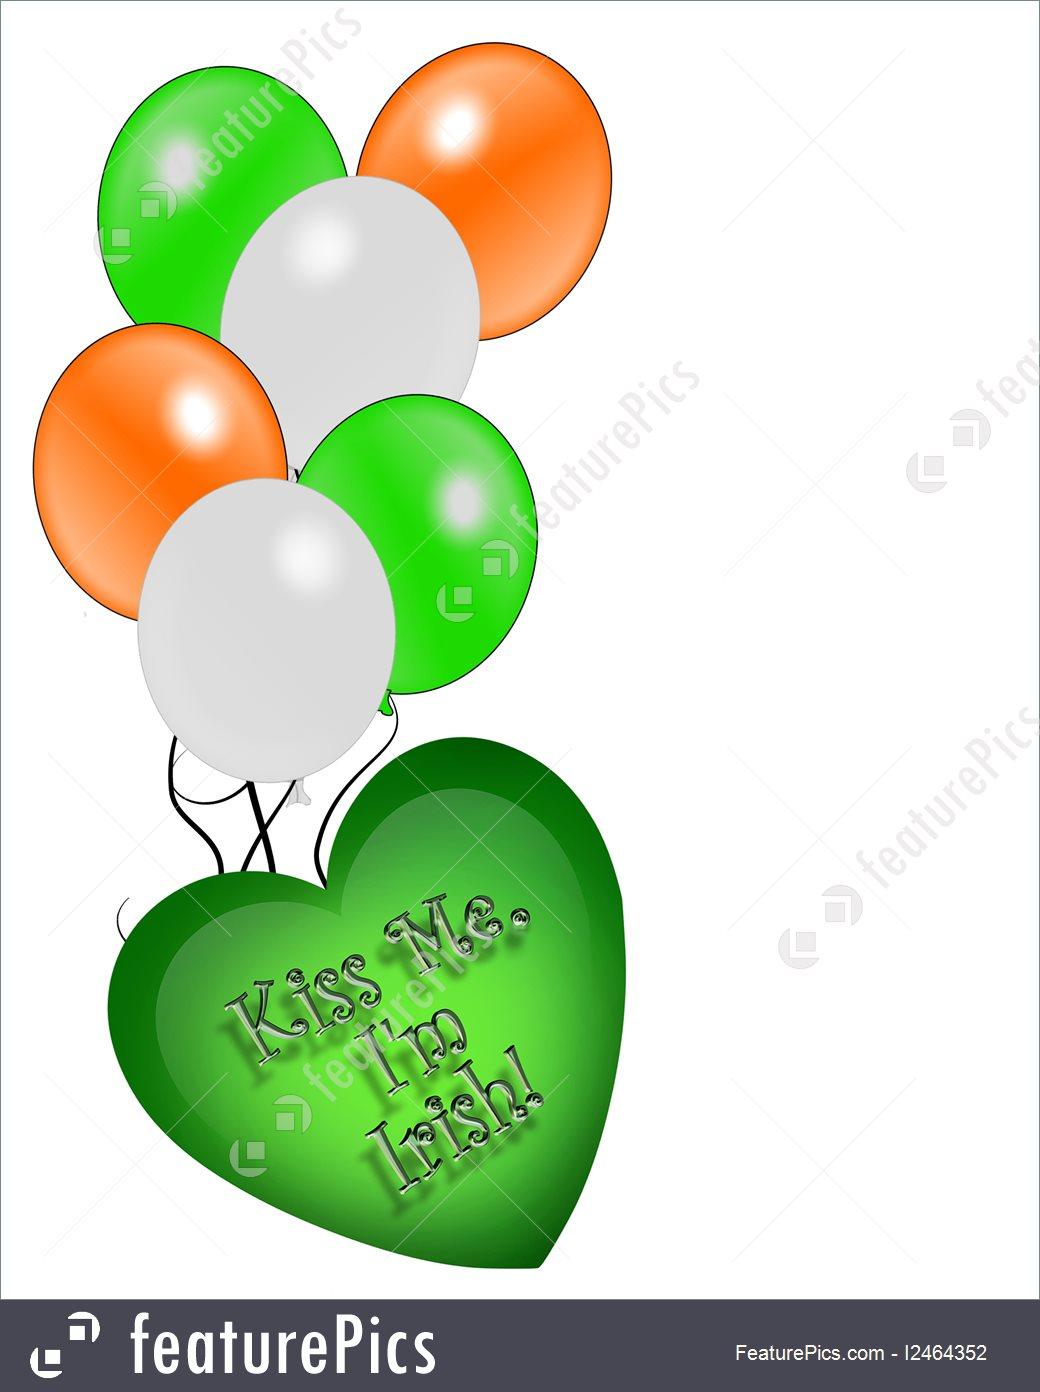 1040x1392 Holidays St Patrick's Day Card Irish Balloons